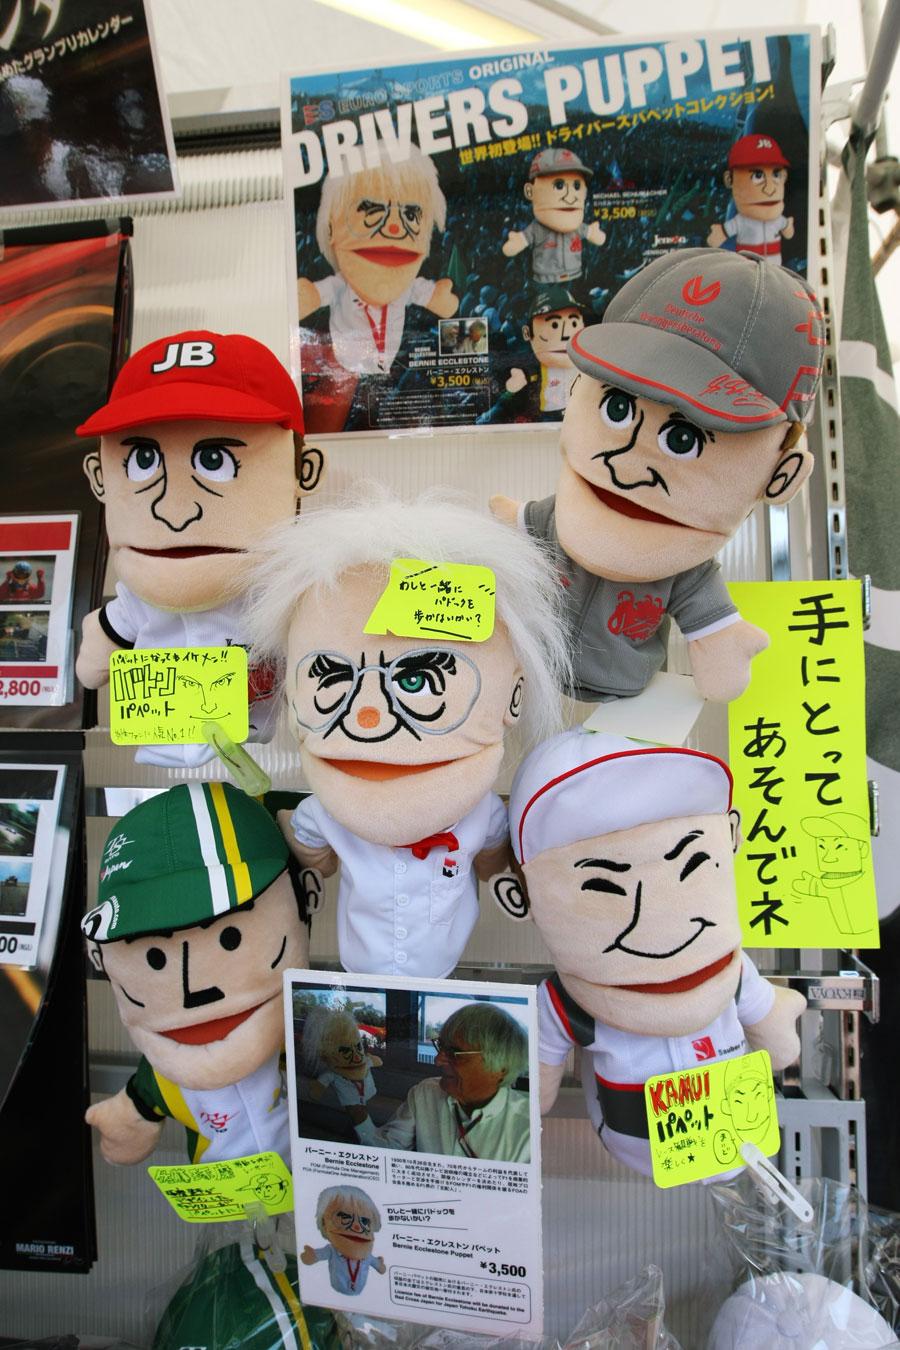 Bernie Ecclestone, Jenson Button, Michael Schumacher, Kamui Kobayashi and Takuma Sato hand puppets in the paddock